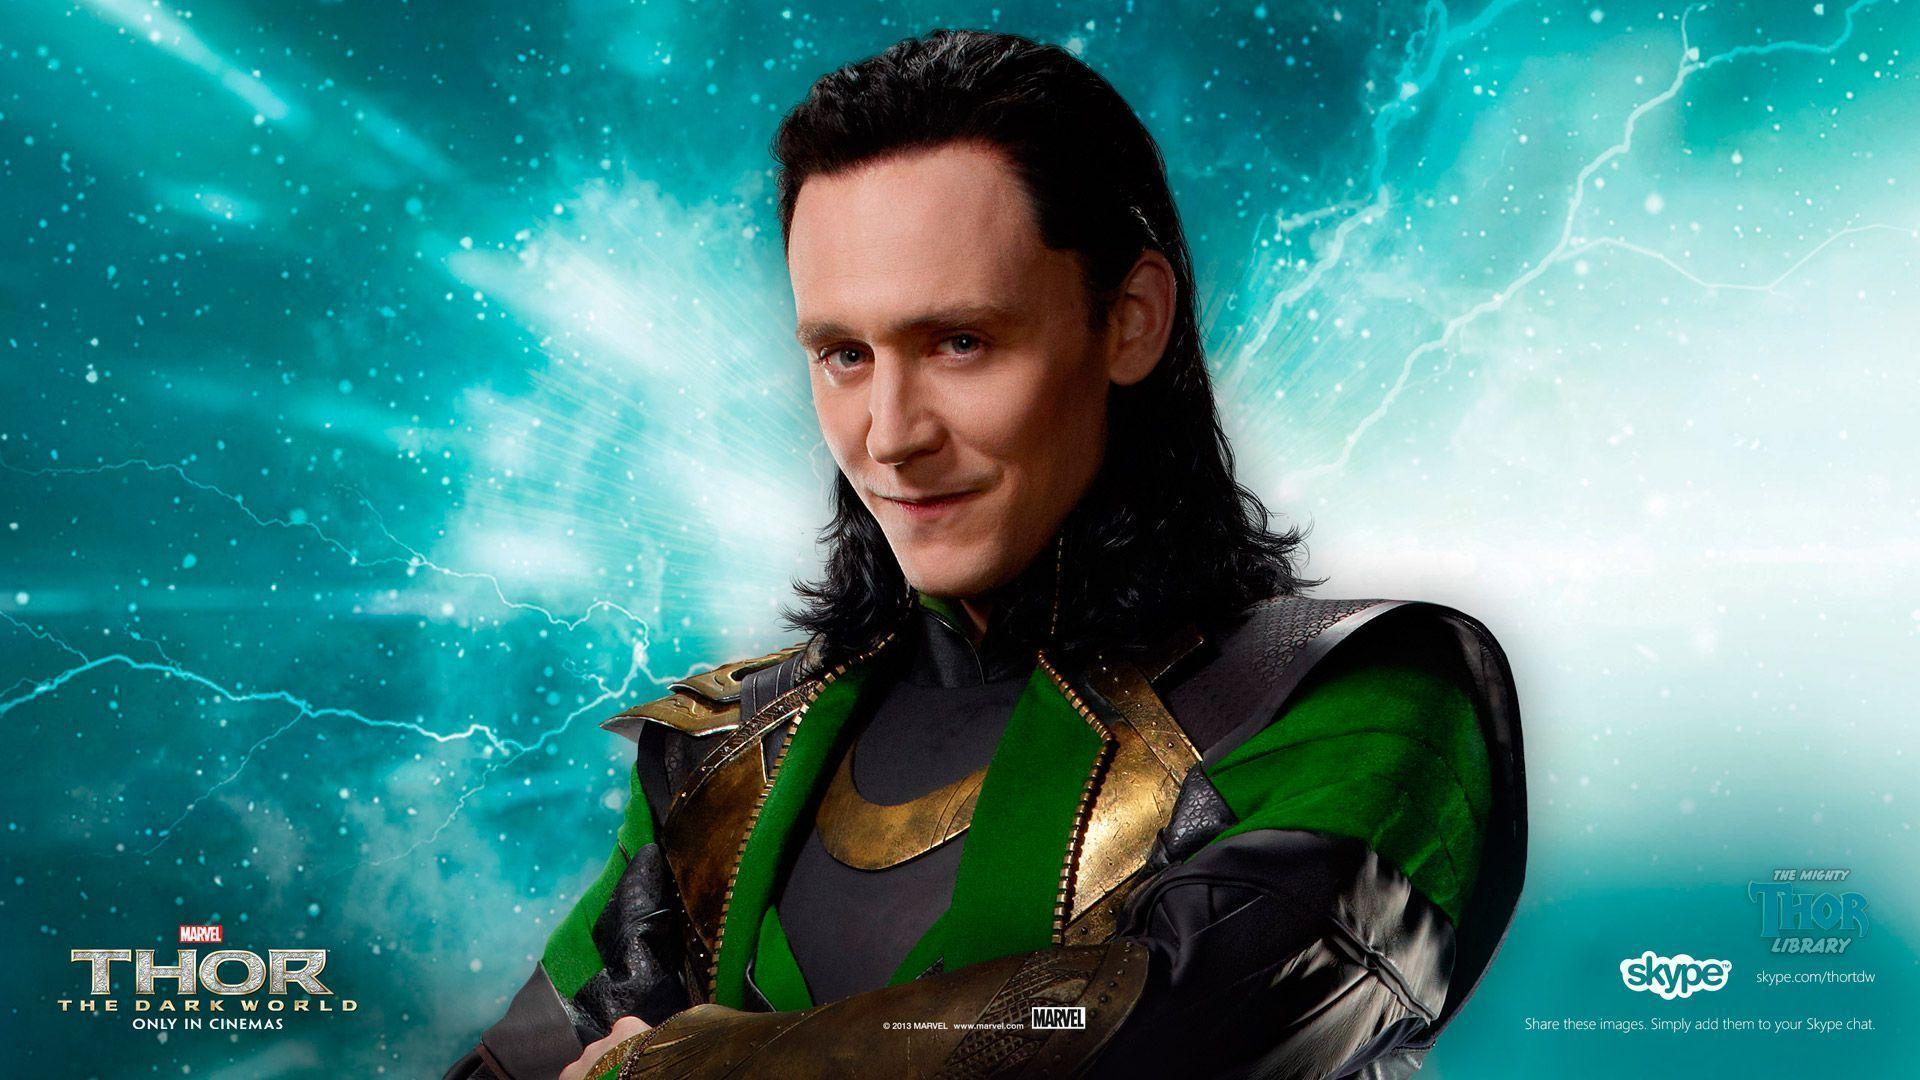 Loki Wallpaper Loki Wallpapers - Wall...